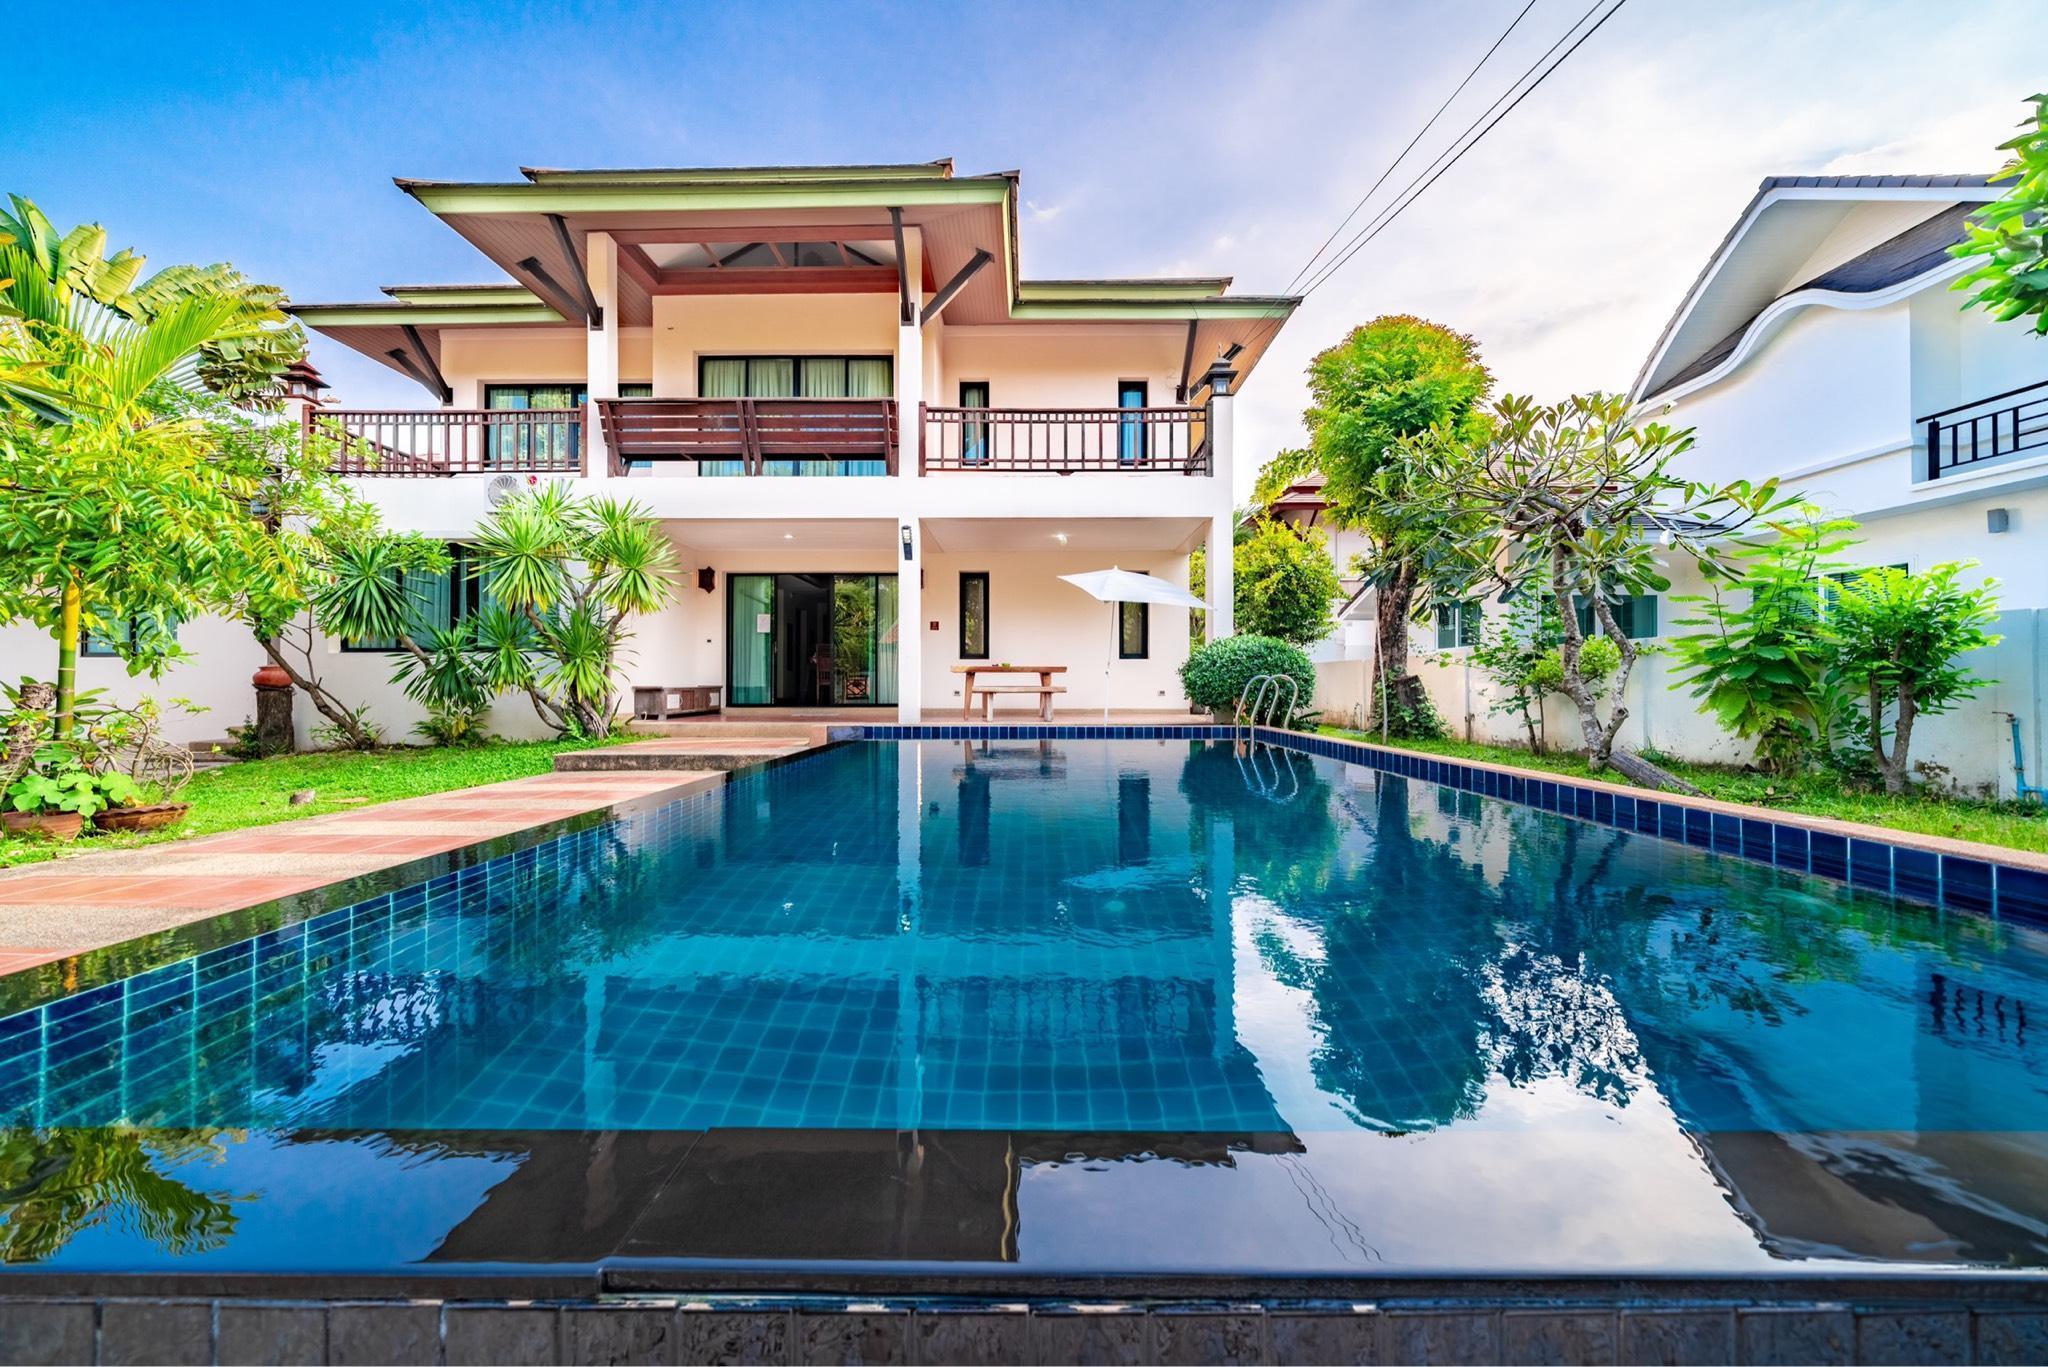 pattaya center luxury pool villa very beautiful วิลลา 5 ห้องนอน 5 ห้องน้ำส่วนตัว ขนาด 400 ตร.ม. – พัทยาเหนือ